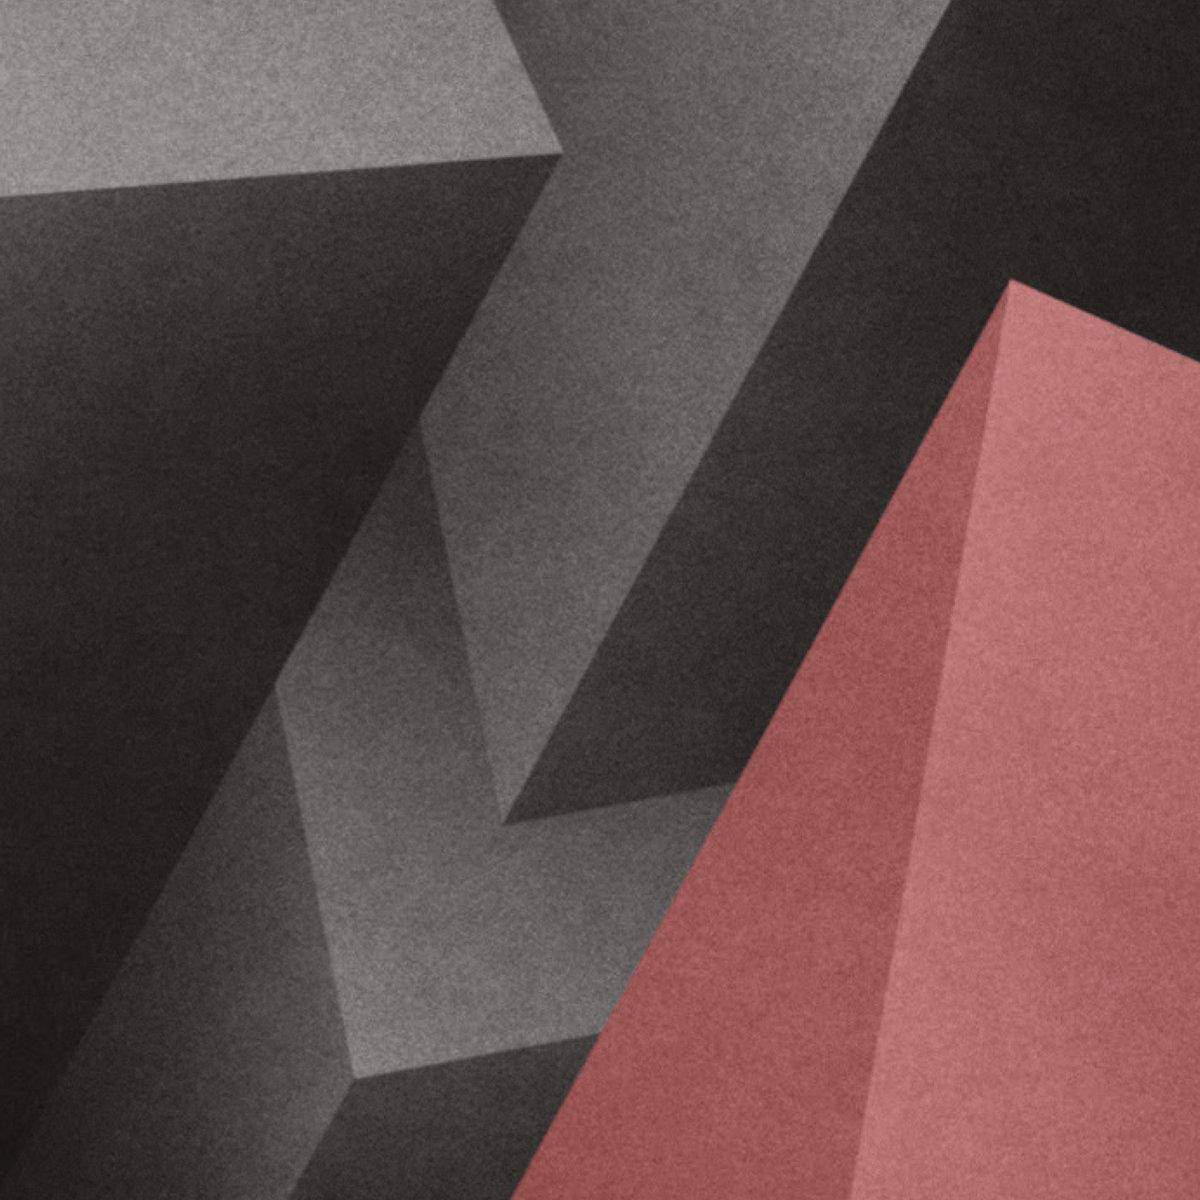 Null + Void featuring Dave Gahan. Where I Wait Remixes Pt. 3 - Alva Noto / Úlfur Eldjárn